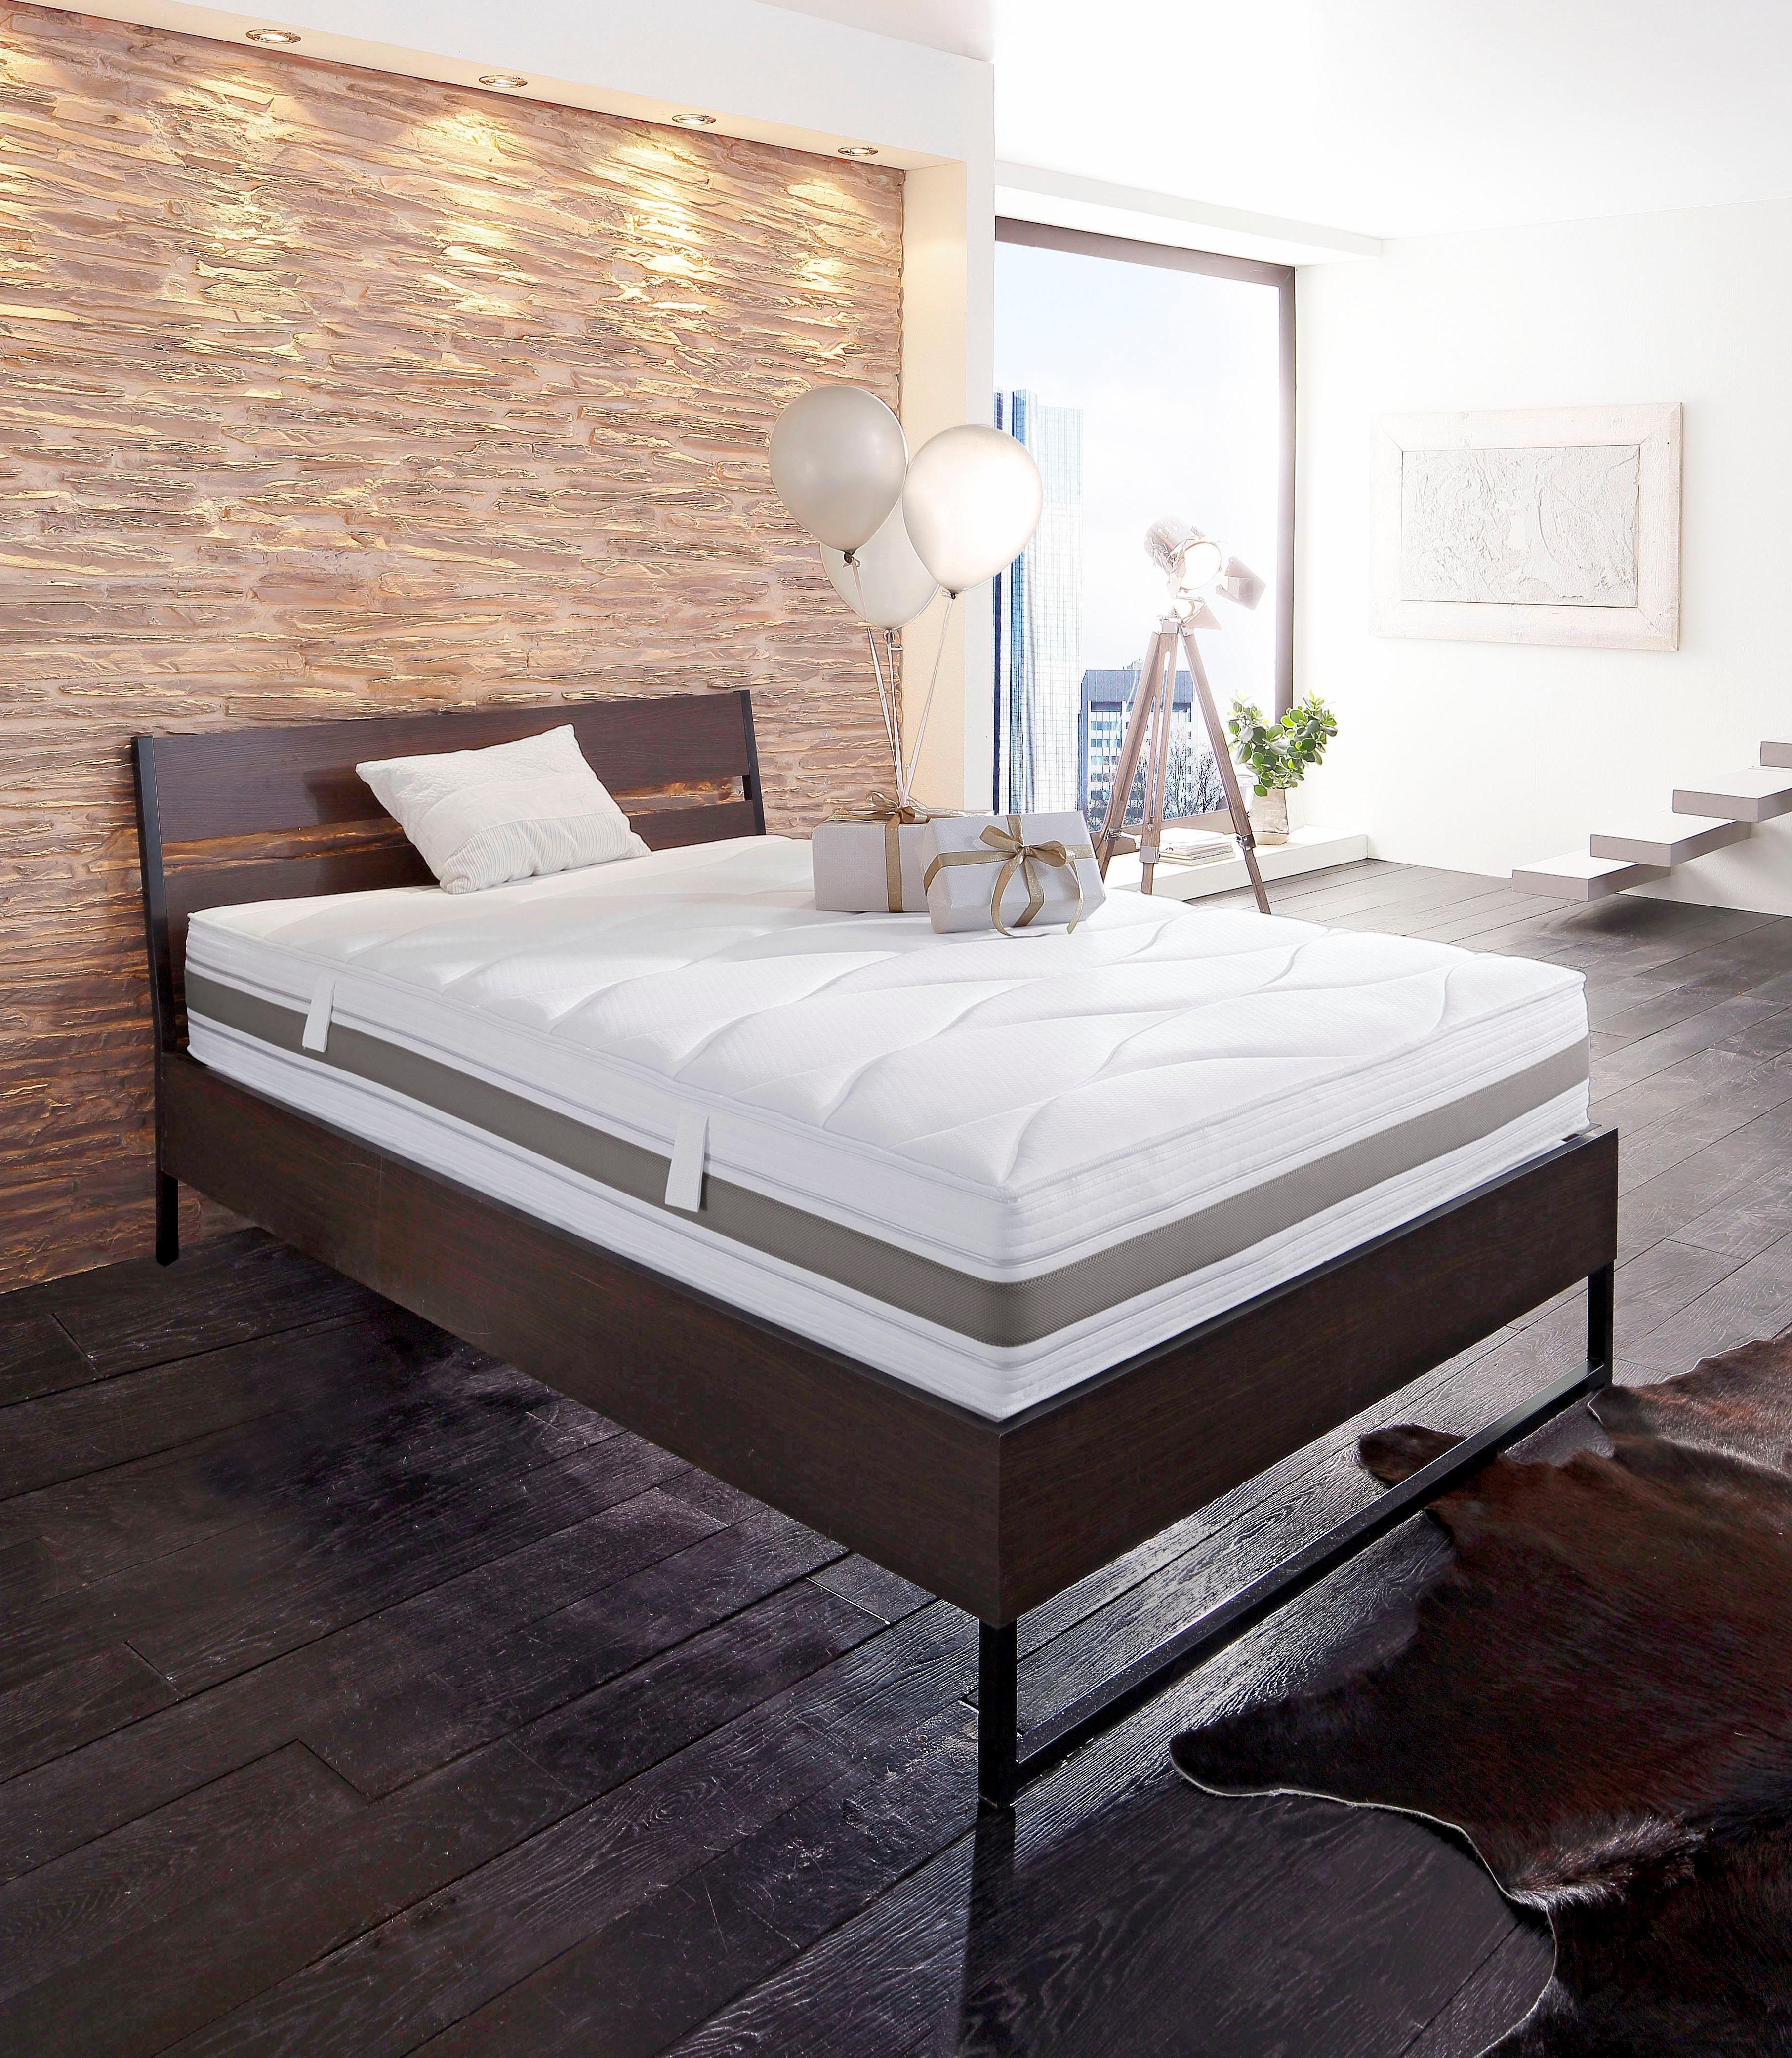 boxspring matrassen kopen vind hier wat je zoekt otto. Black Bedroom Furniture Sets. Home Design Ideas